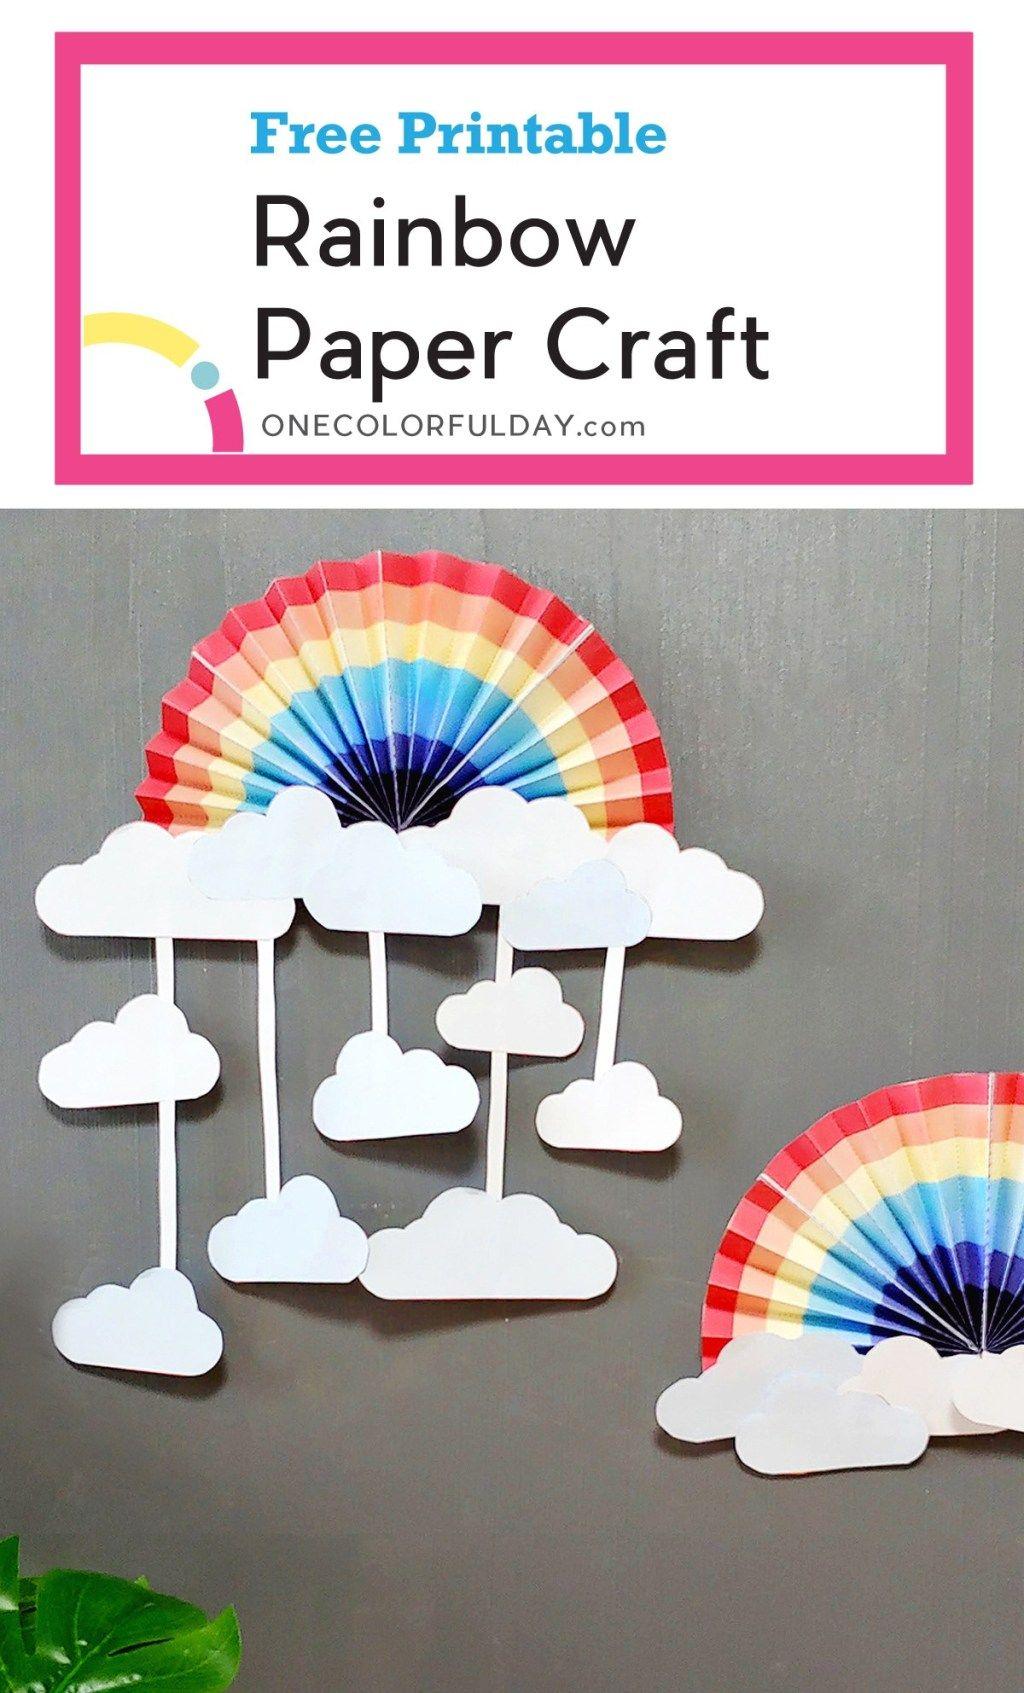 Printable Rainbow Craft - PRINTABLE CRAFTS - OneColorfulDay #rainbowcrafts